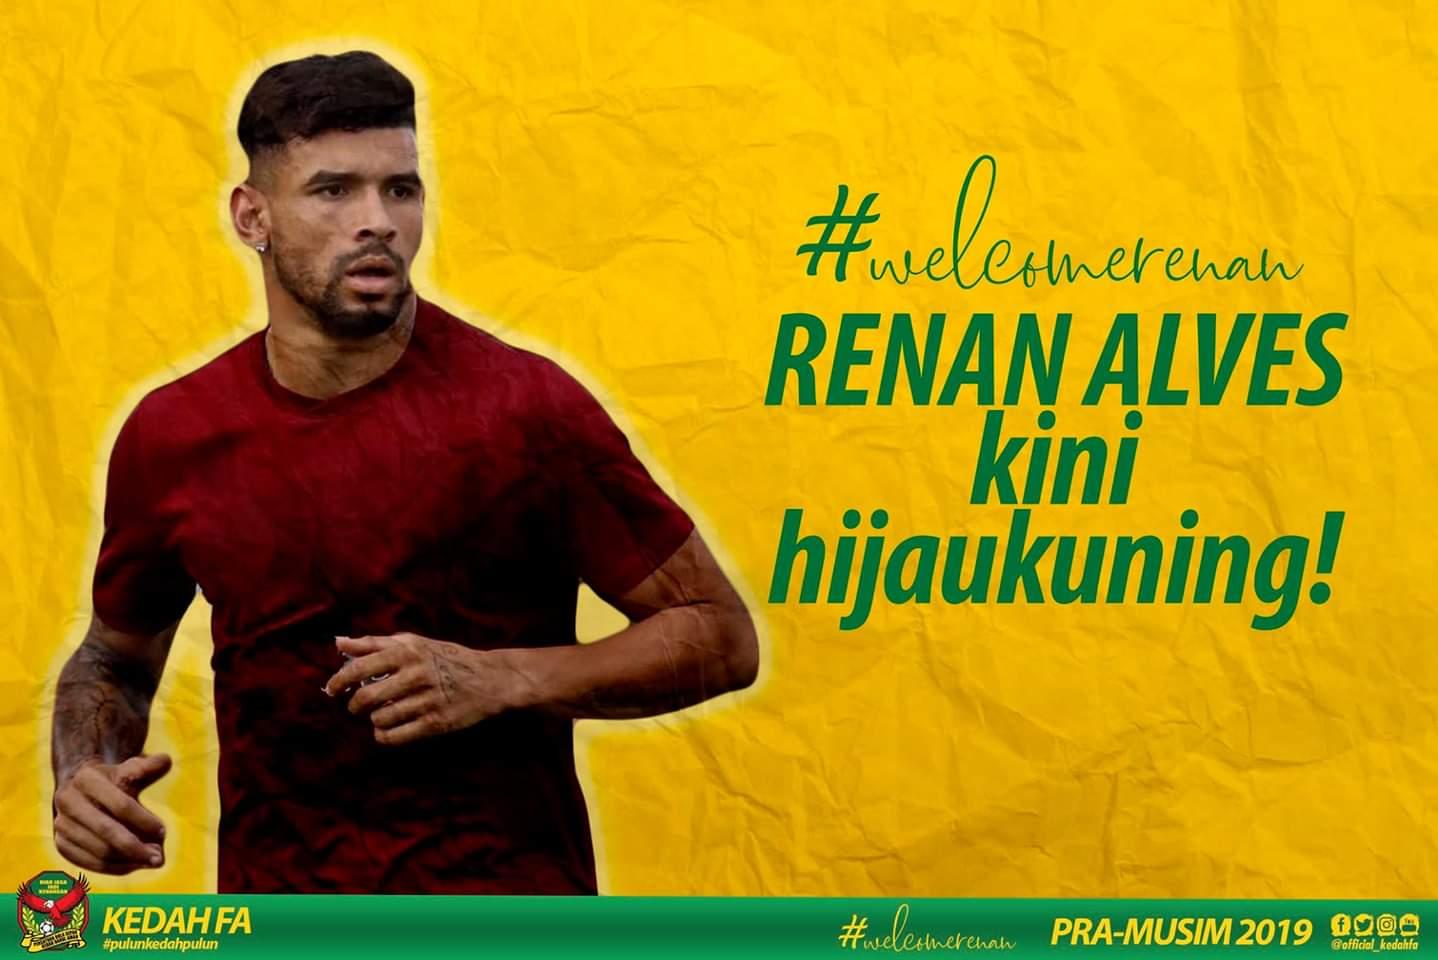 Fernando Rodríguez dan Renan Alves Sah Import Baharu Kedah FA